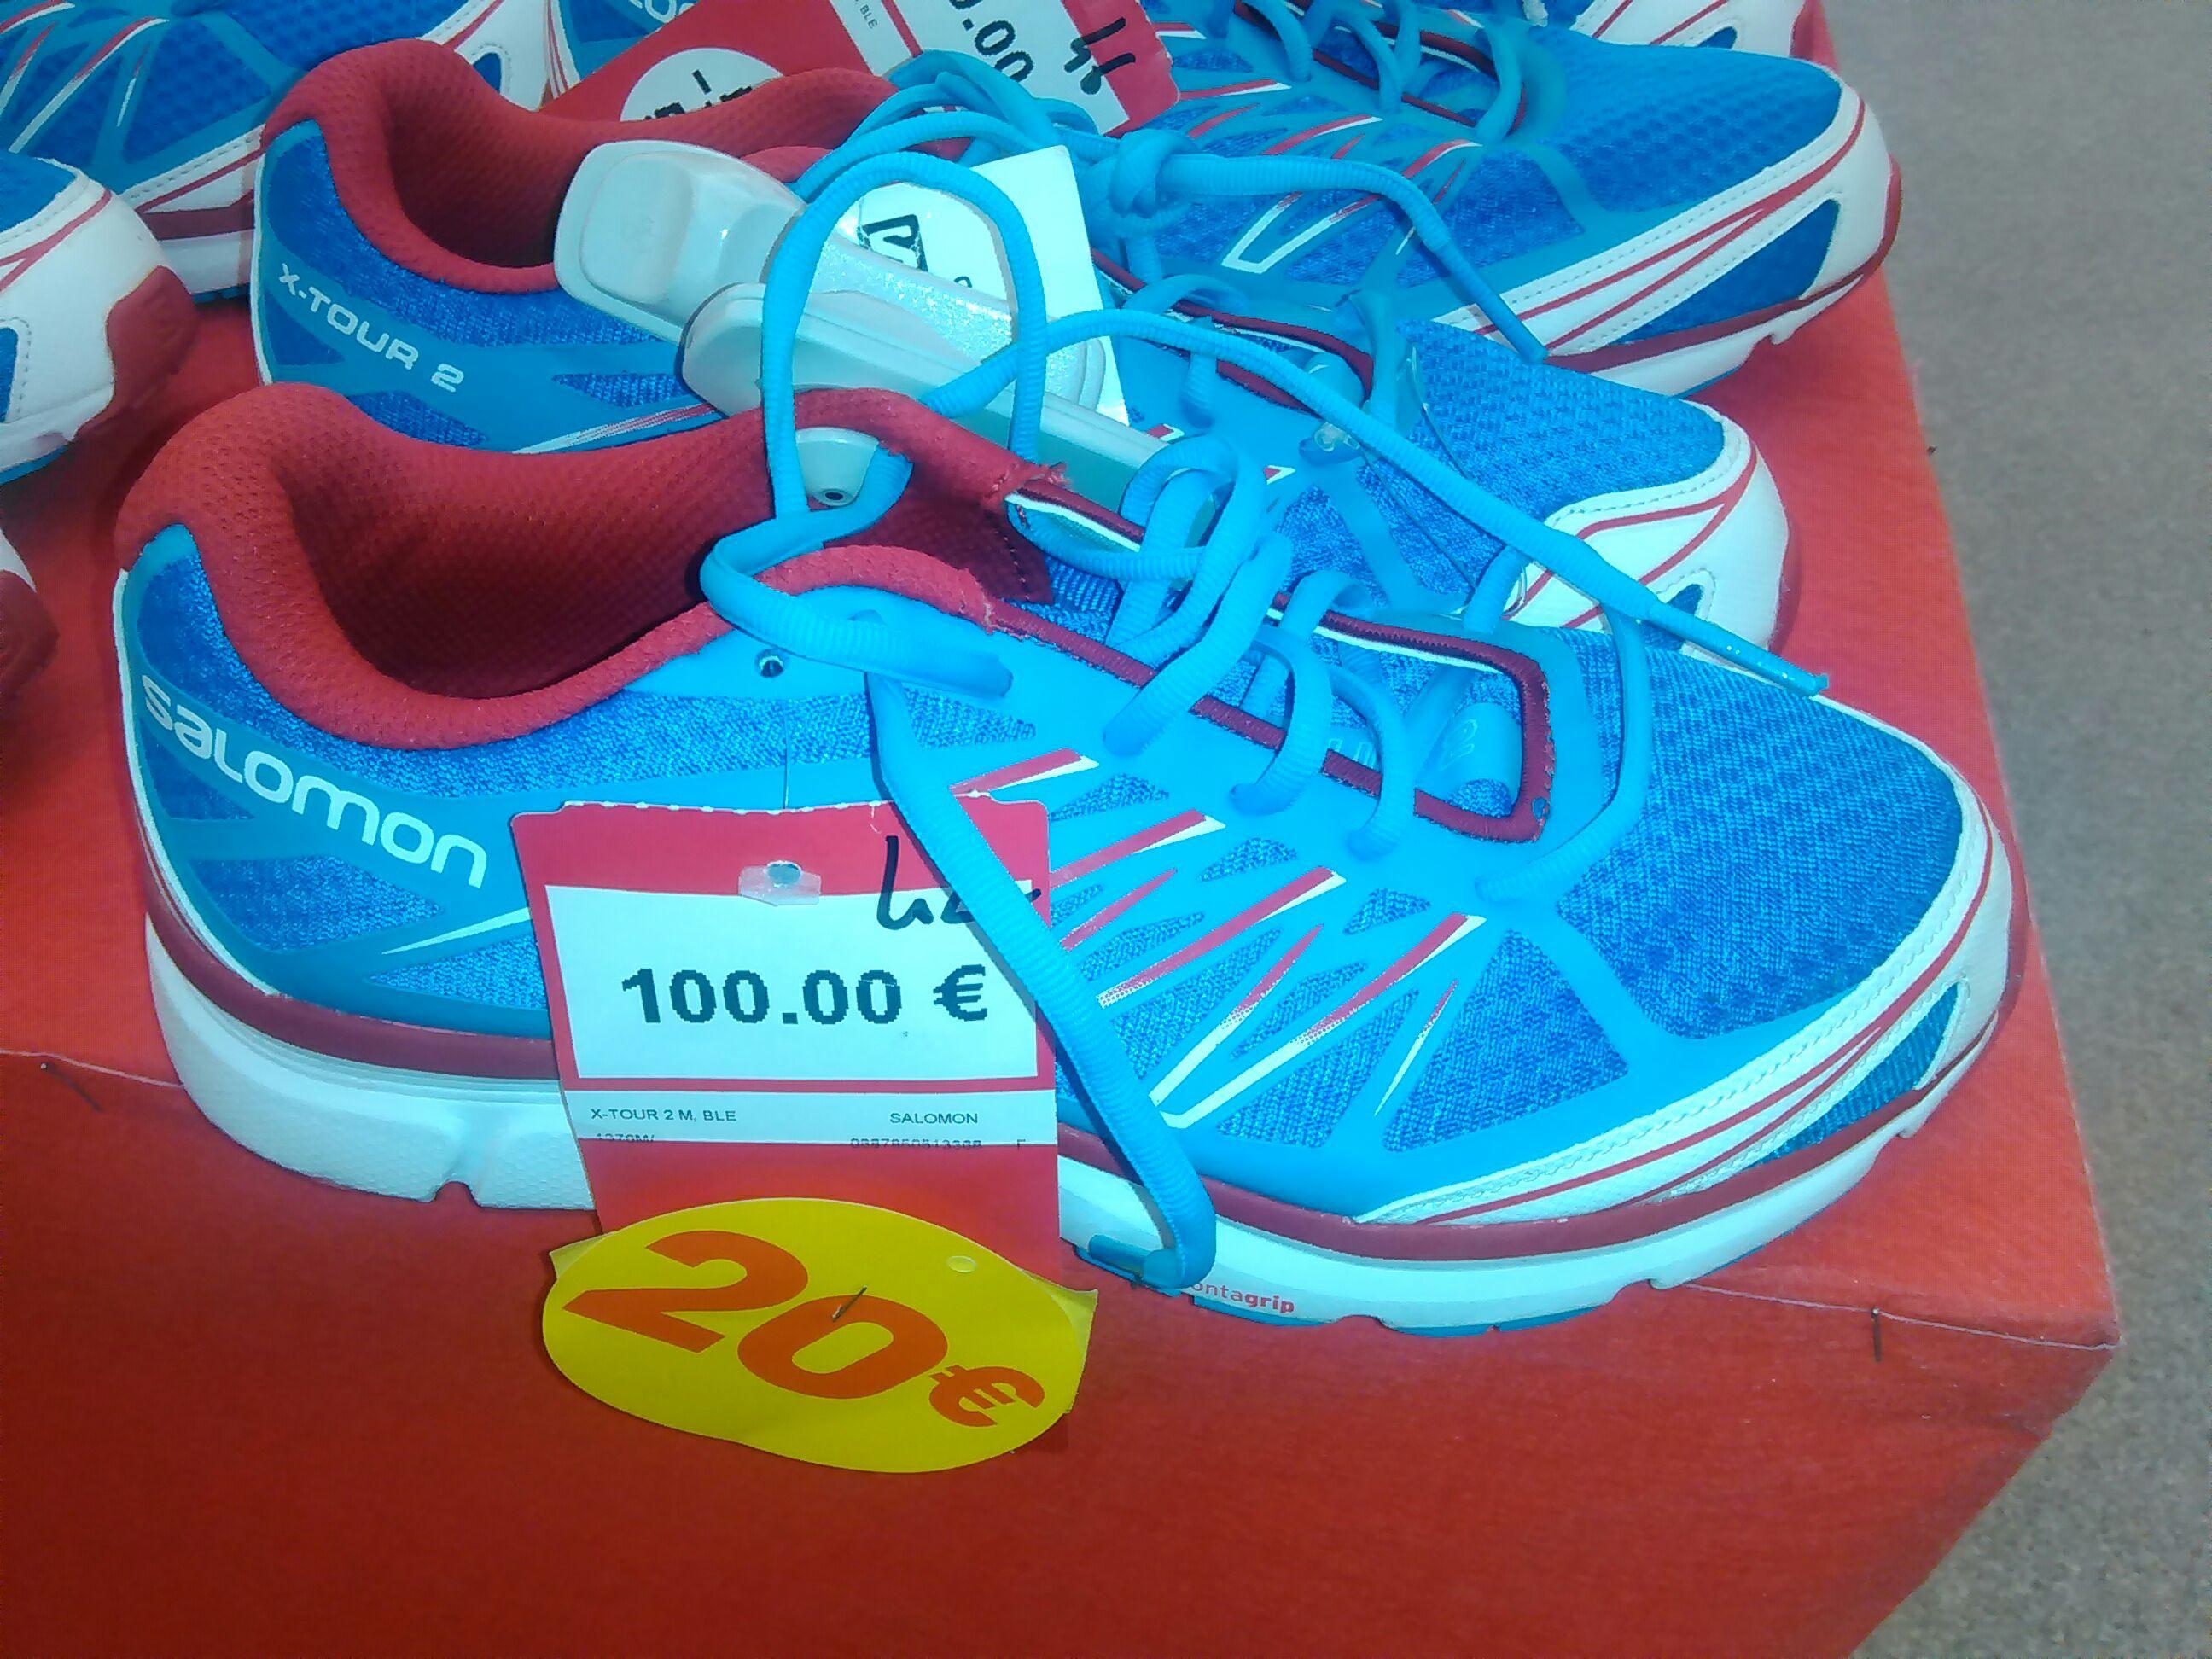 Chaussures de running Salomon (Taille 42 à 46)